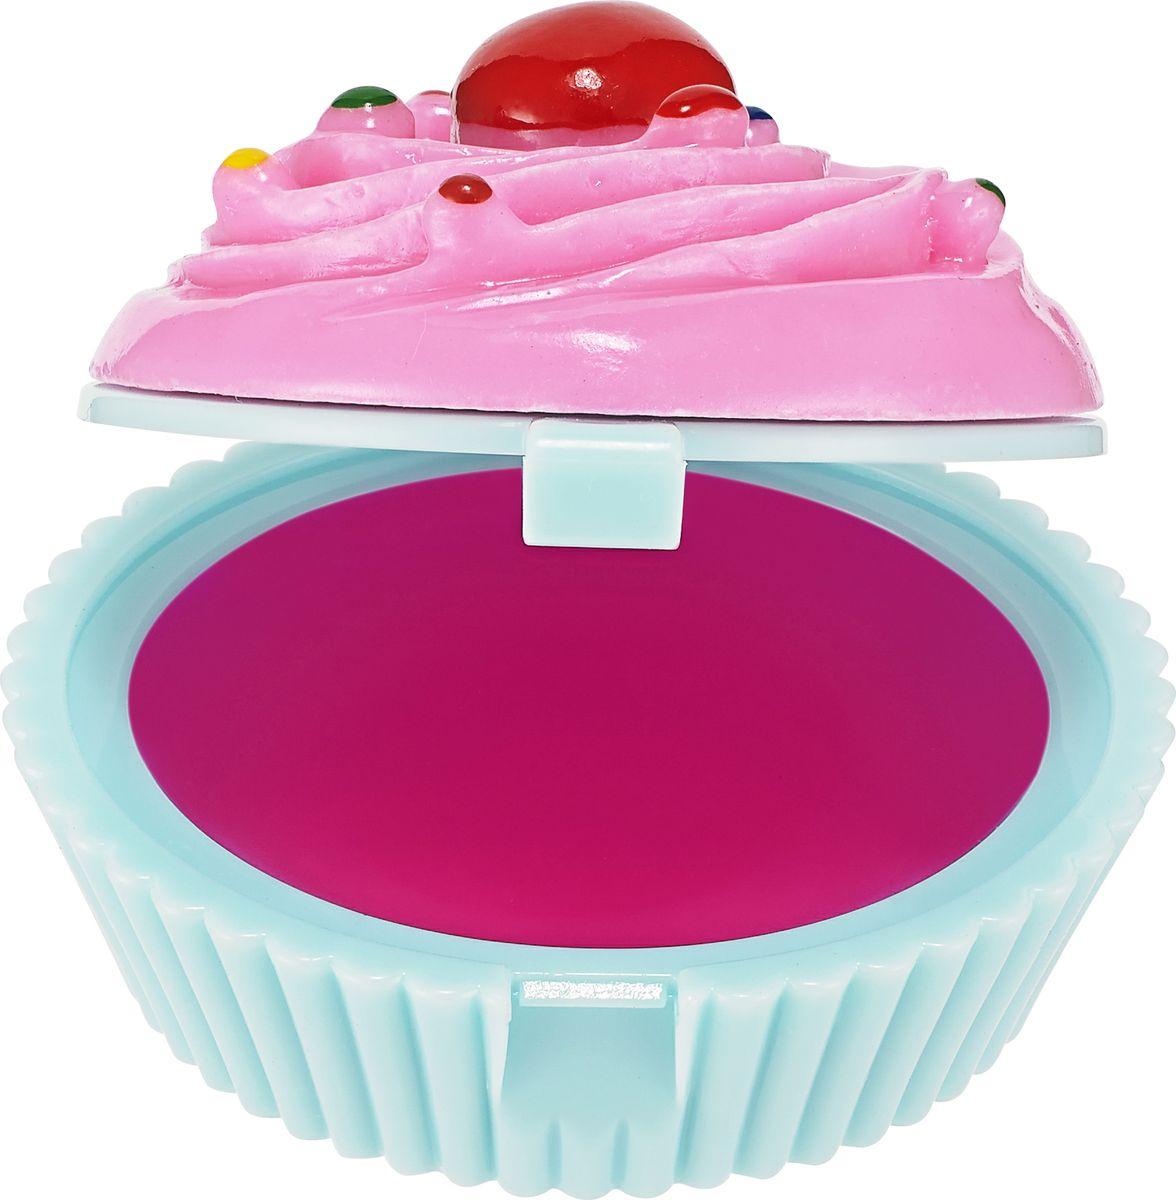 Holika Holika Бальзам для губ Время дессерта, тон 04, розовая слива, 7 гFS-008976668 Holika Holika Dessert Time Lip Balm AD04 (Plumpink Cup Cake) Бальзам для губ Время дессерта (Пирожное розовая слива).